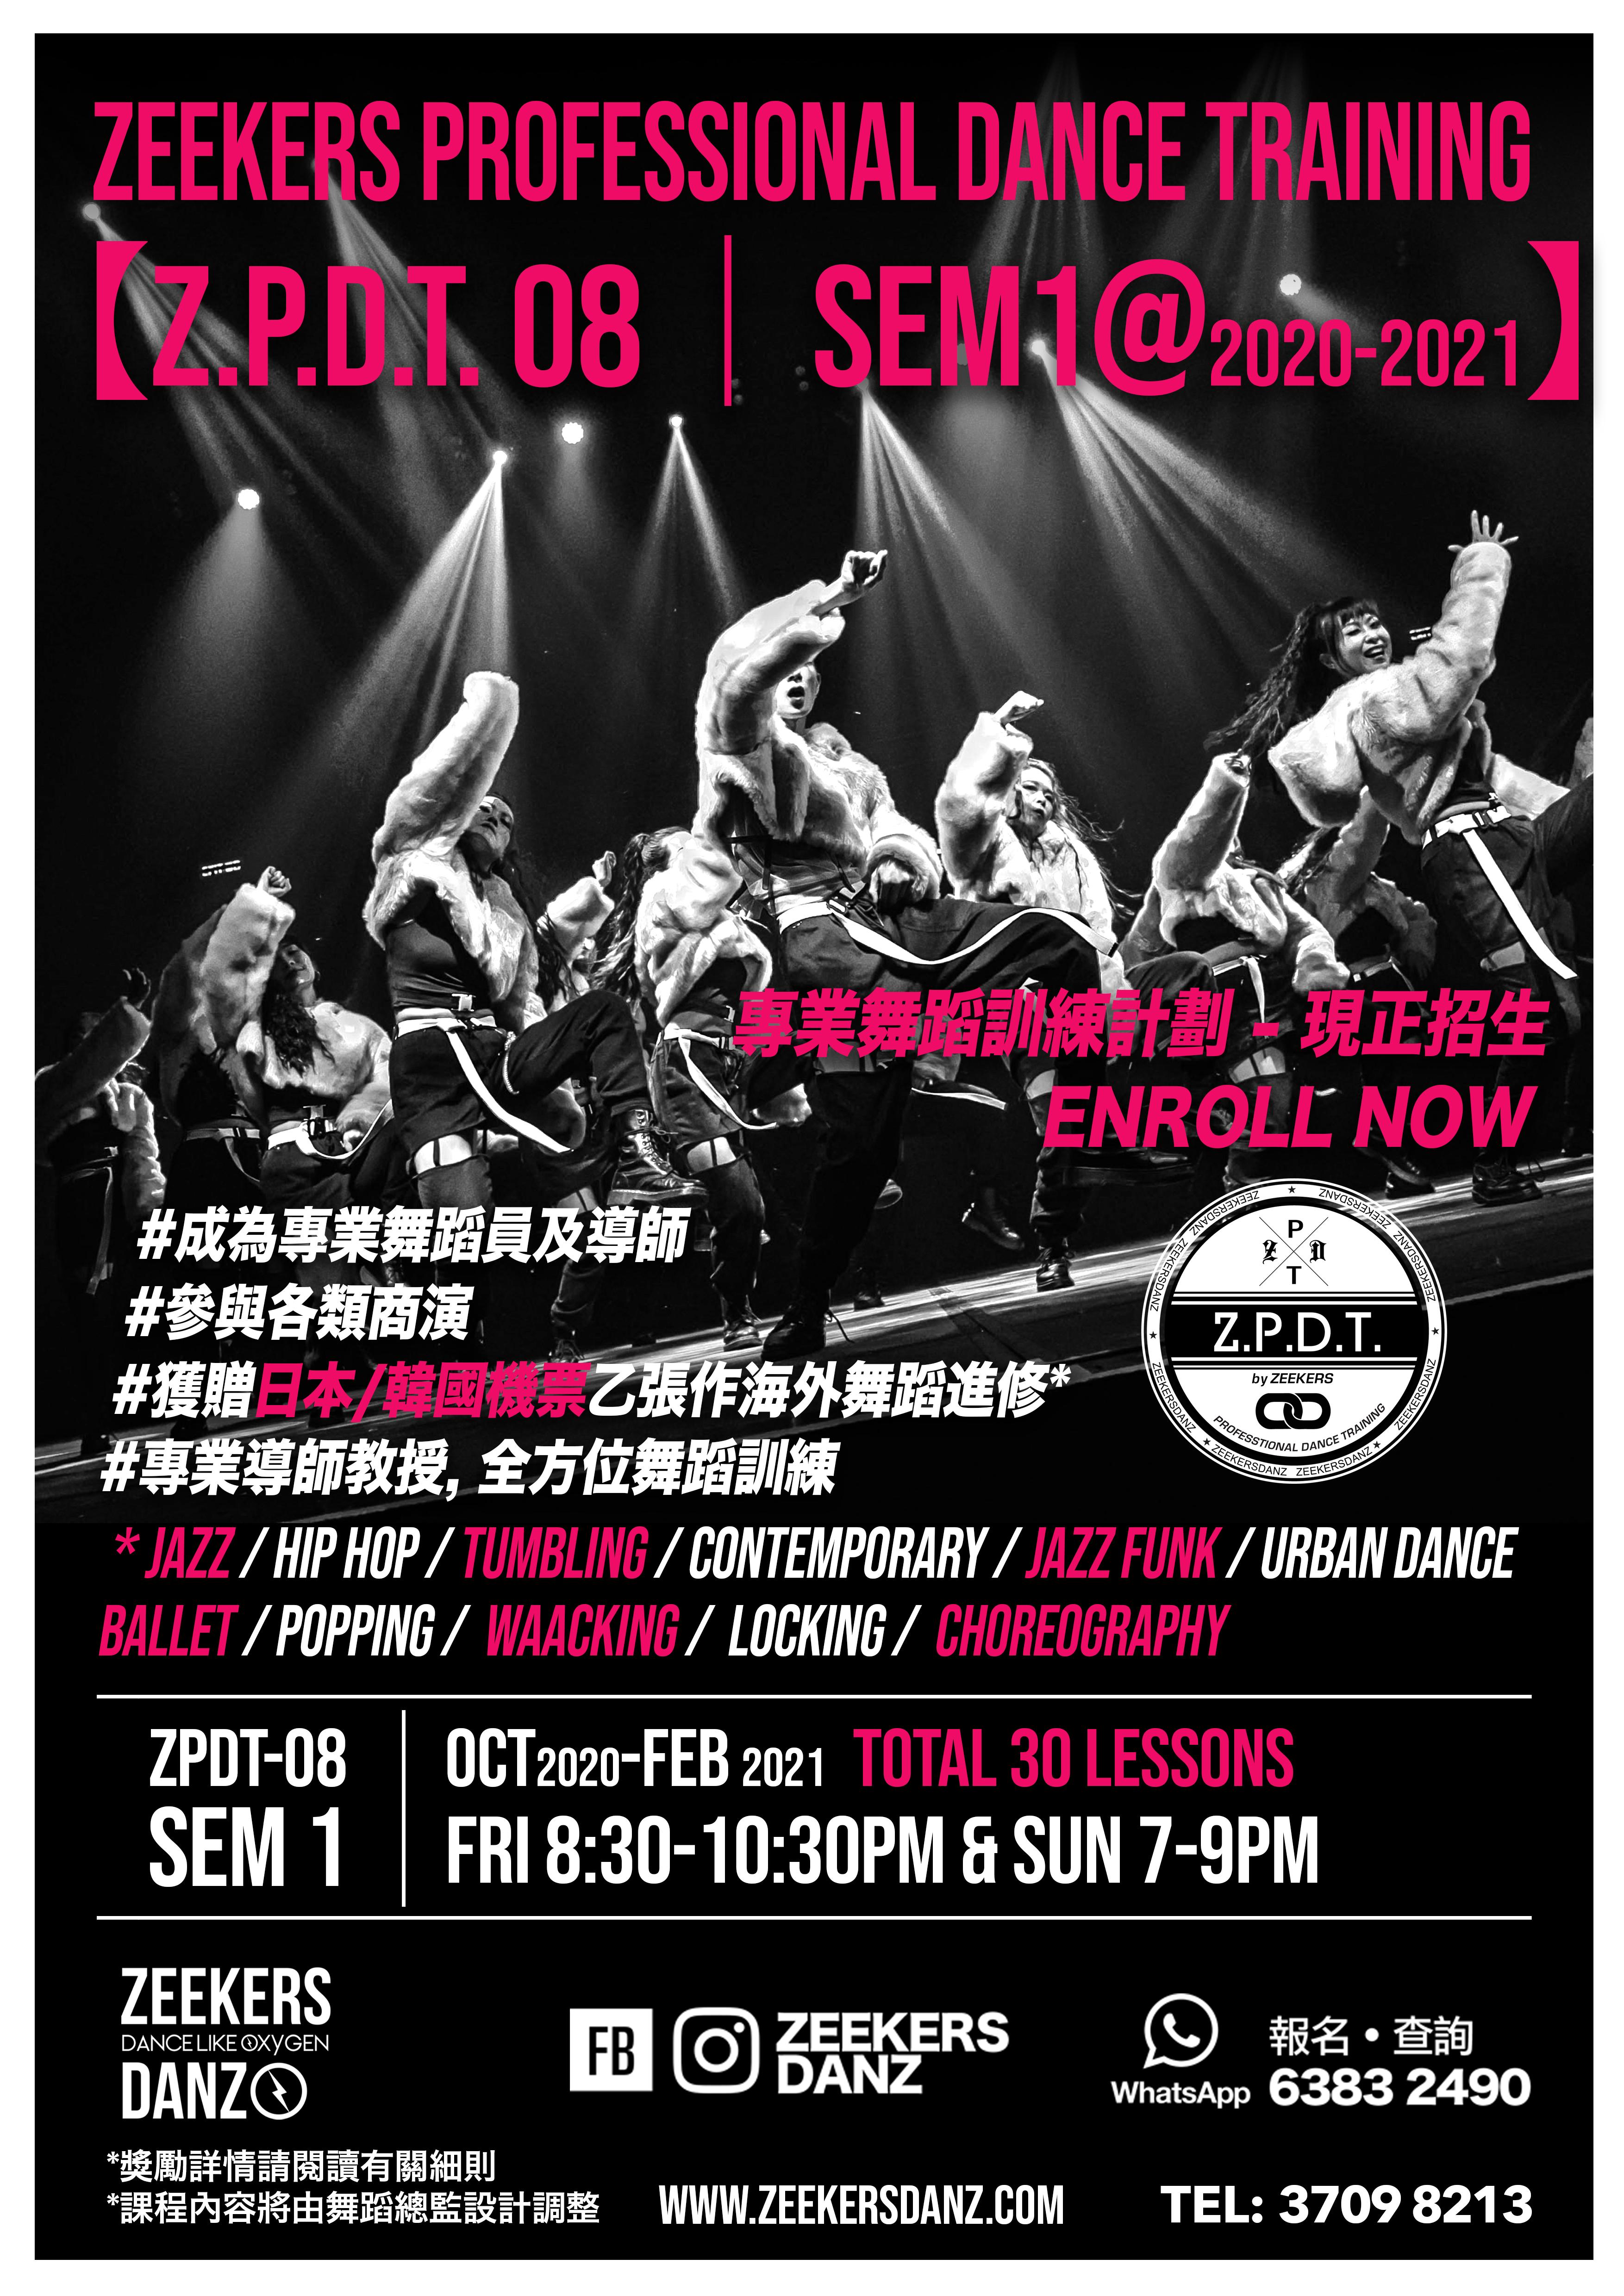 【Z.P.D.T. 08|2020-2021】  Zeekers Professional Dance Training 專業舞蹈訓練計劃 ⚡上學期現正招生⚡